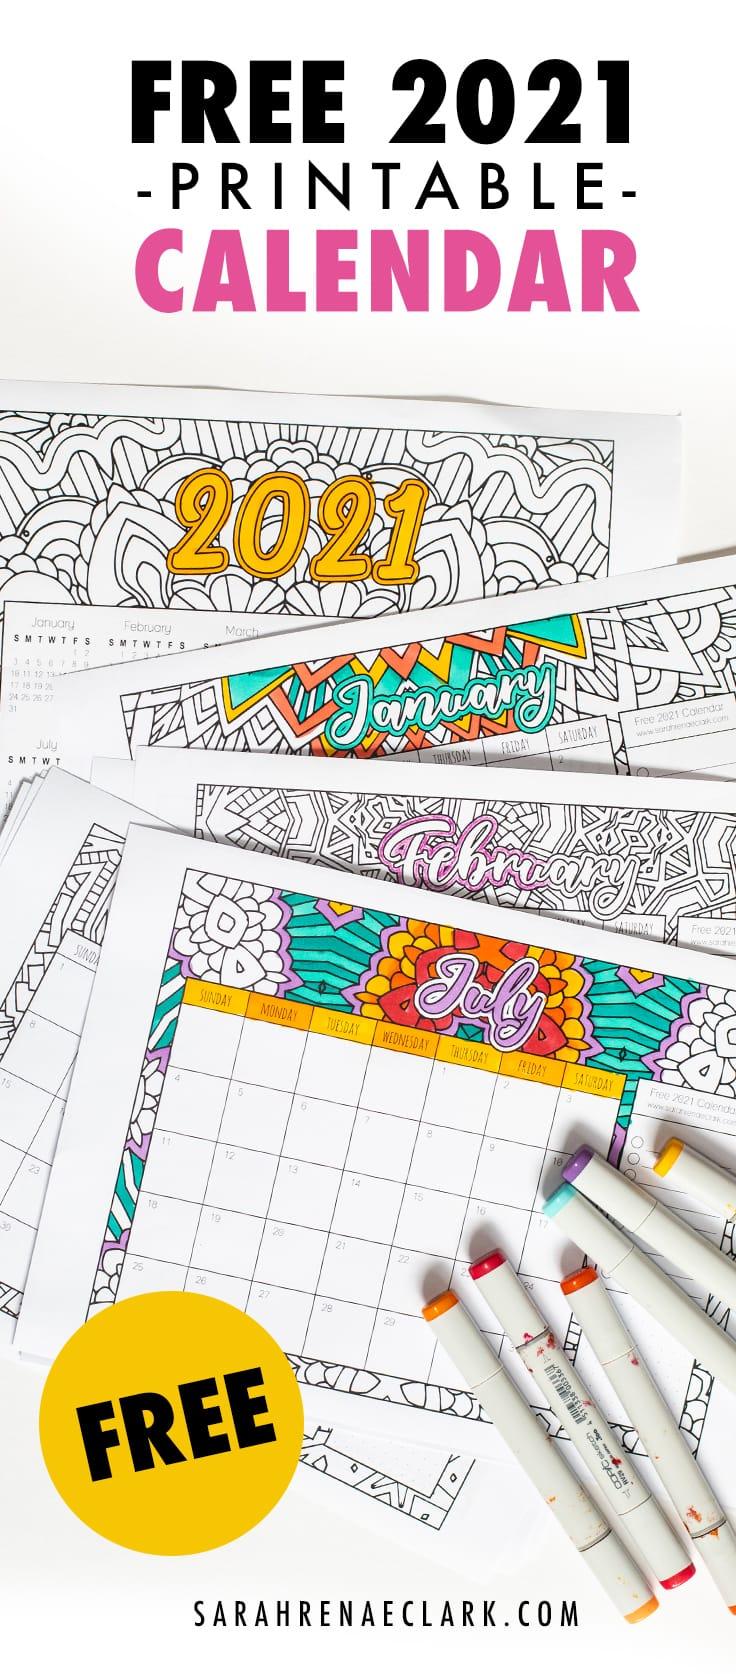 Get a free printable 2021 coloring calendar